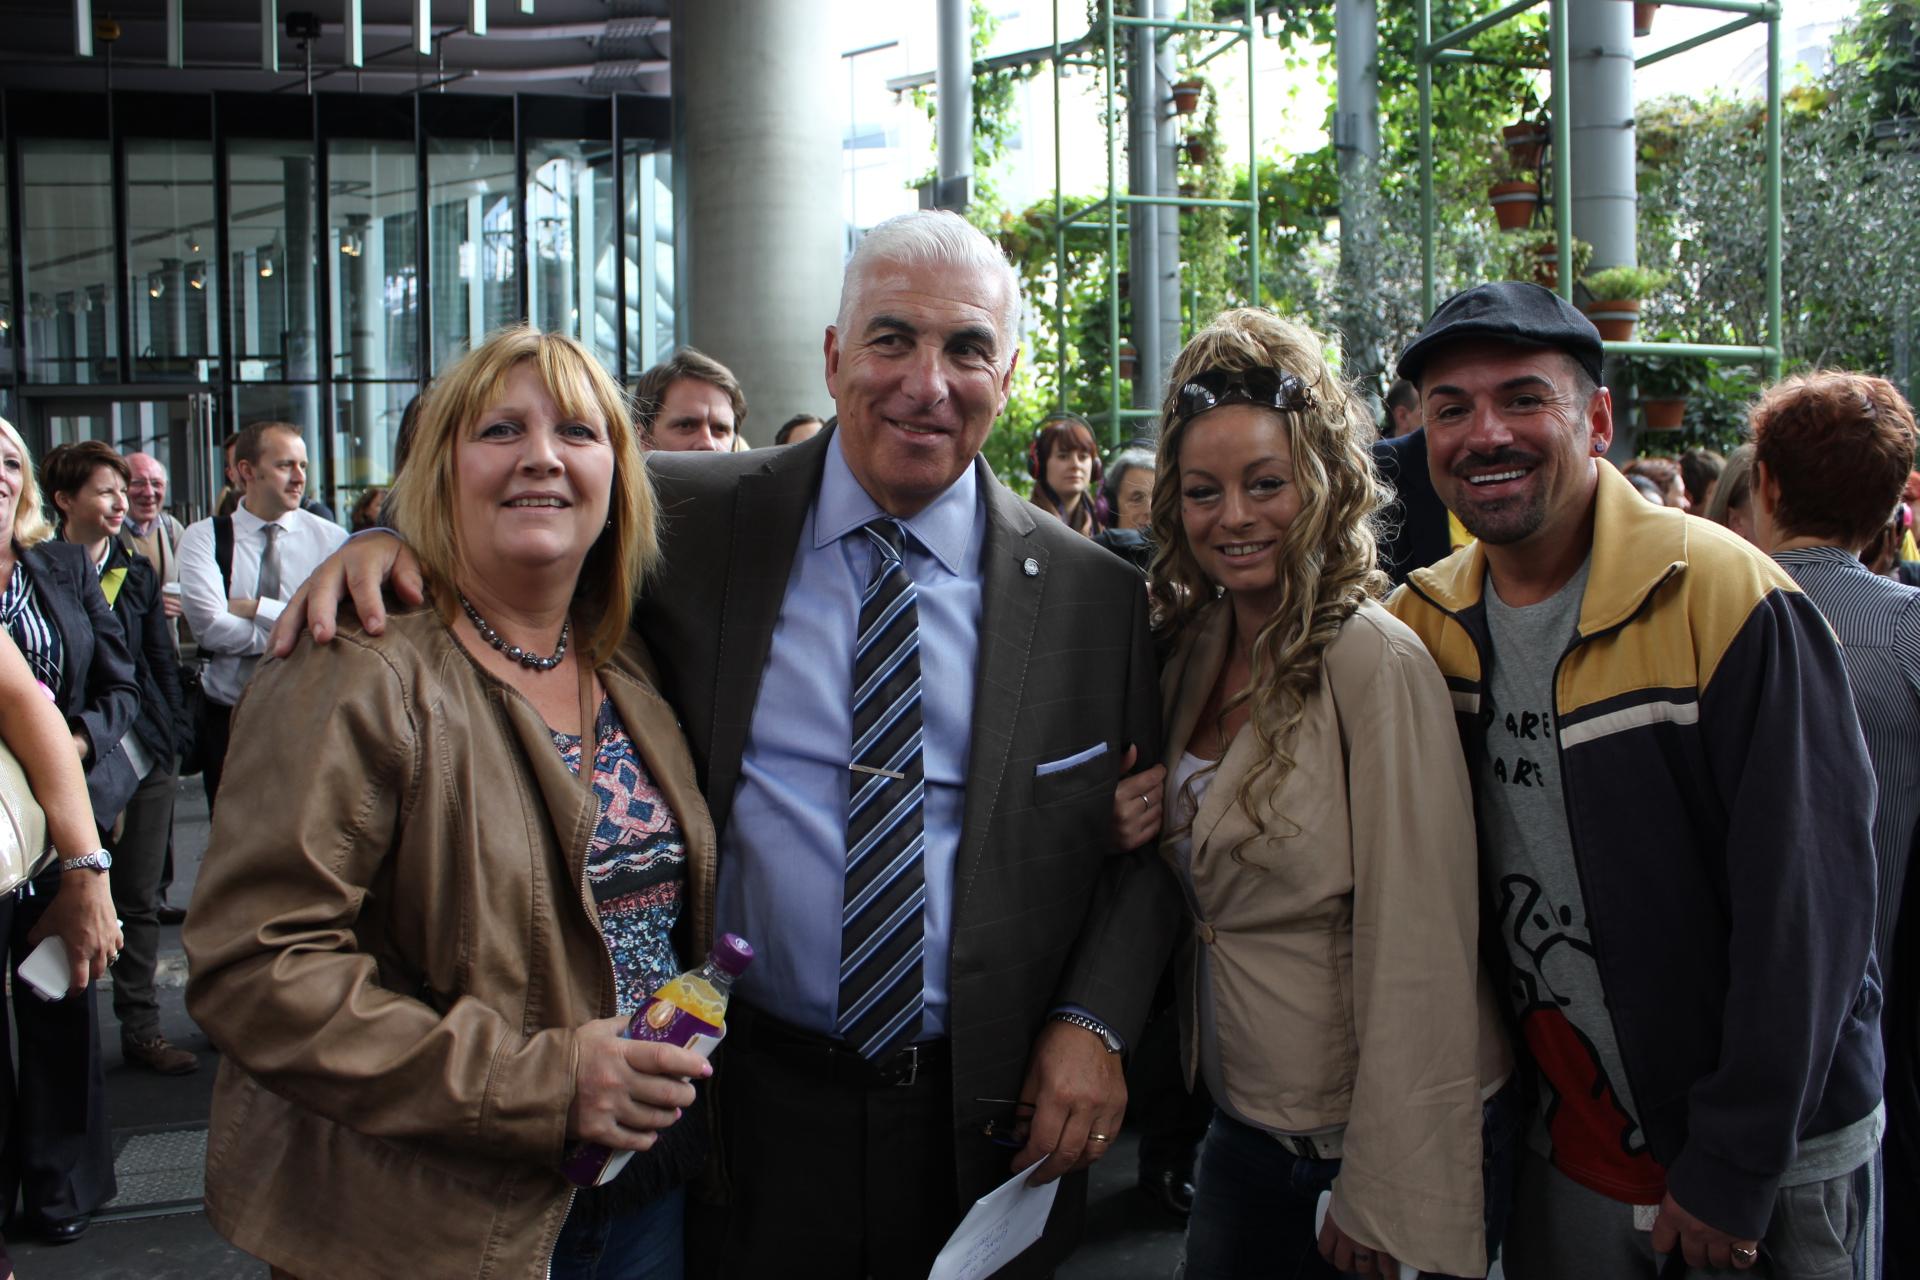 Mick-Winehouse-with-Jenny-Sheree-and-Echo